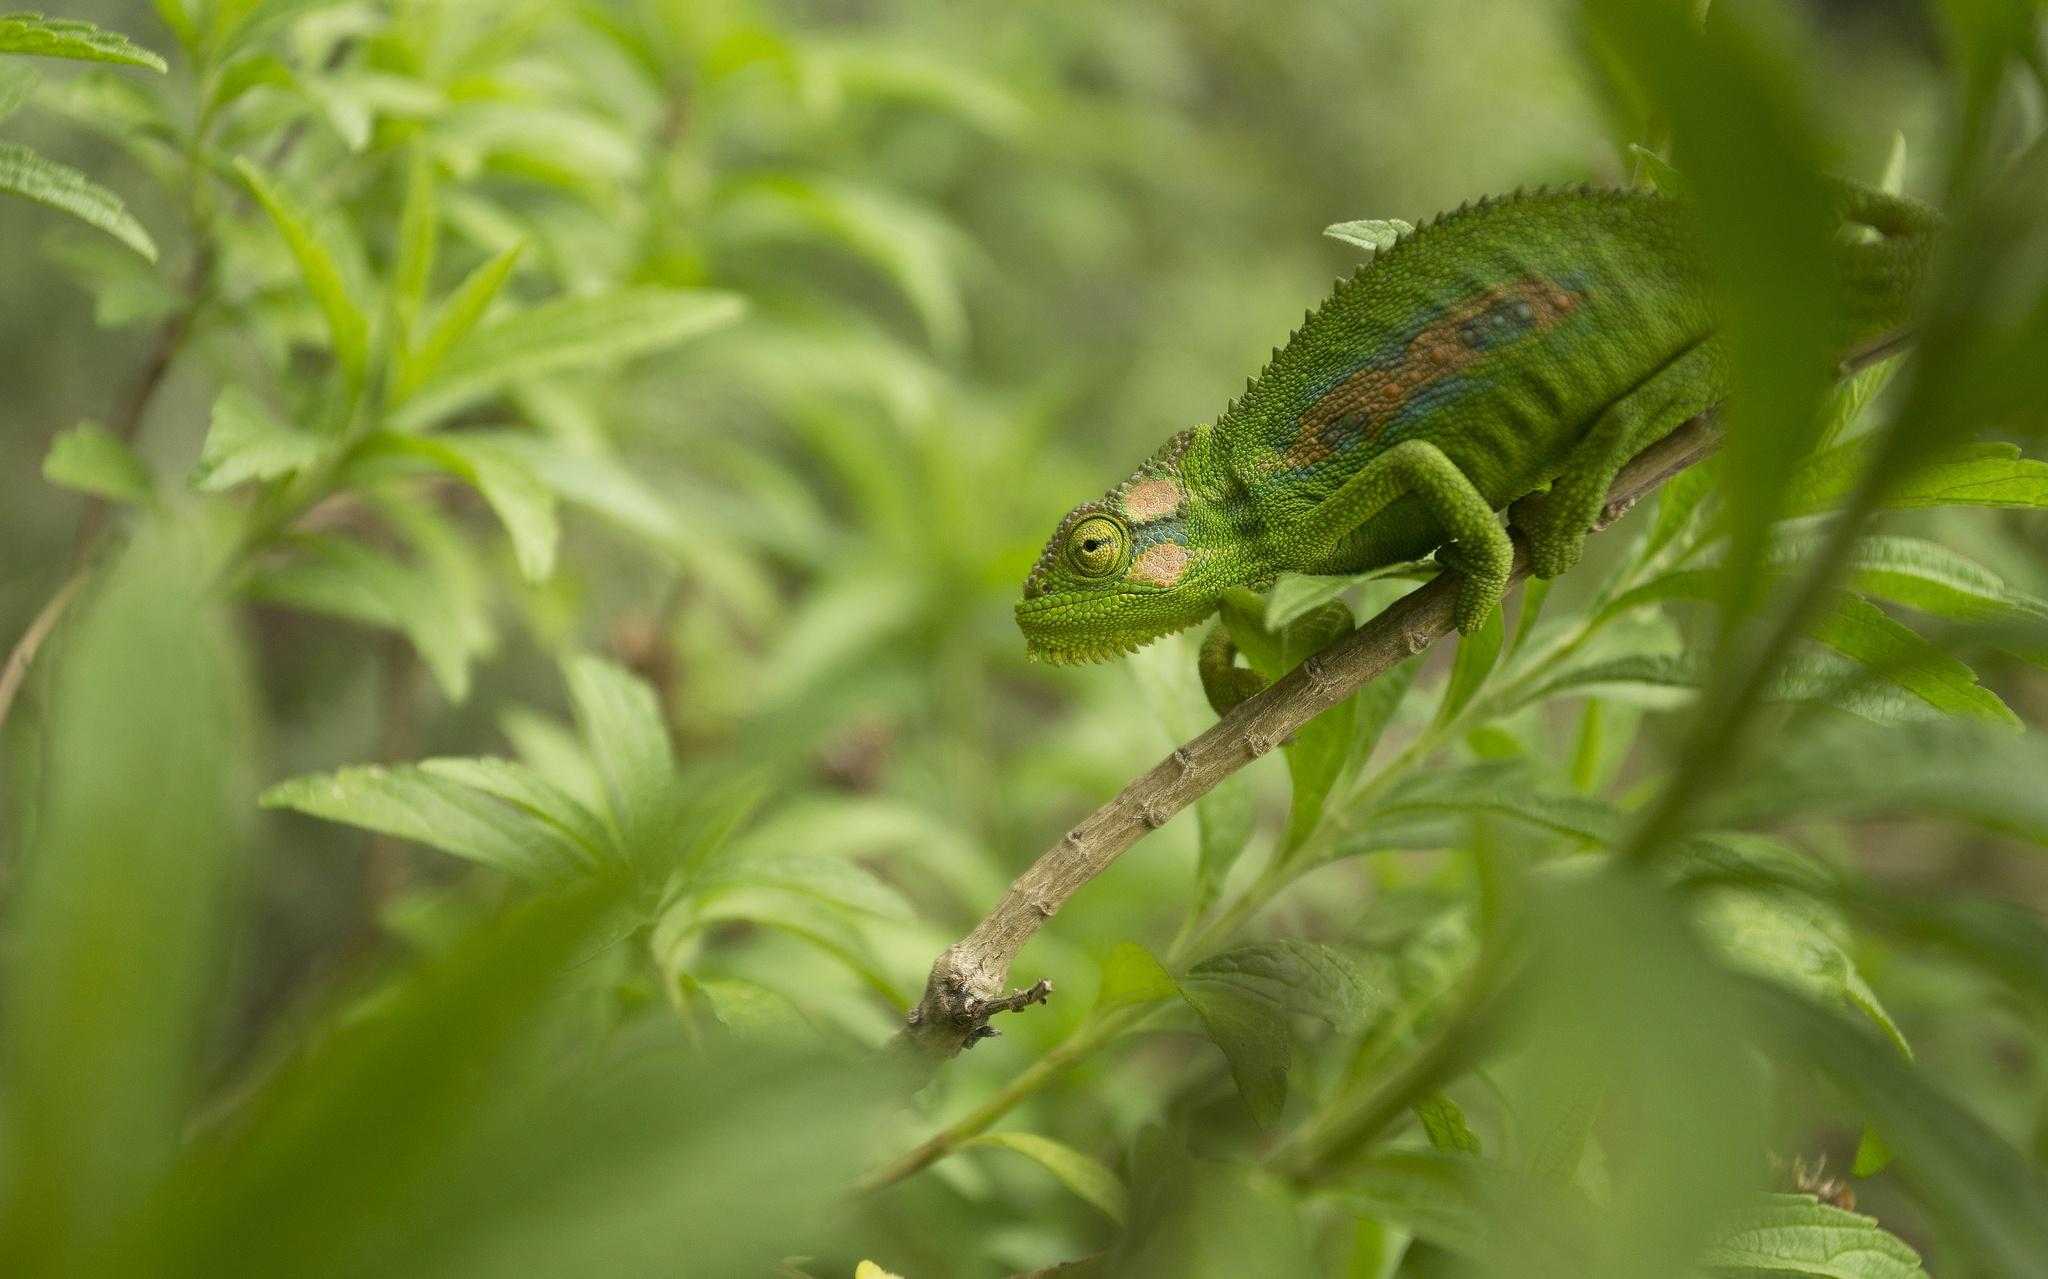 Lizard Reptile Green Wildlife 2048x1279